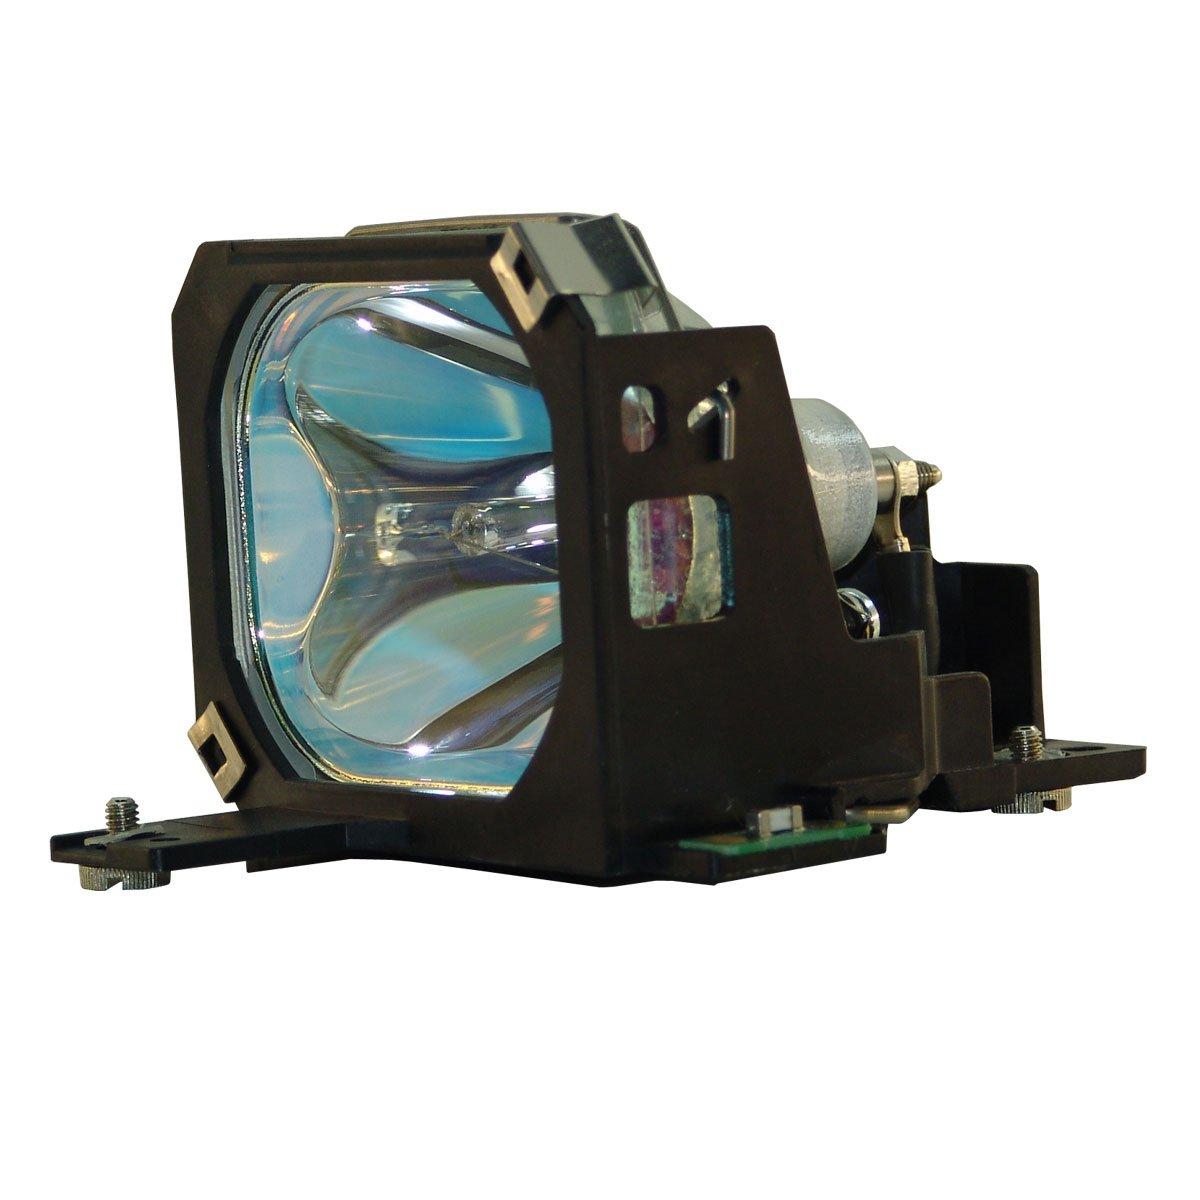 SpArcプロジェクター交換用ランプ 囲い/電球付き Ask Proxima C2用 Economy Economy Lamp with Housing B07MPSGWJ4